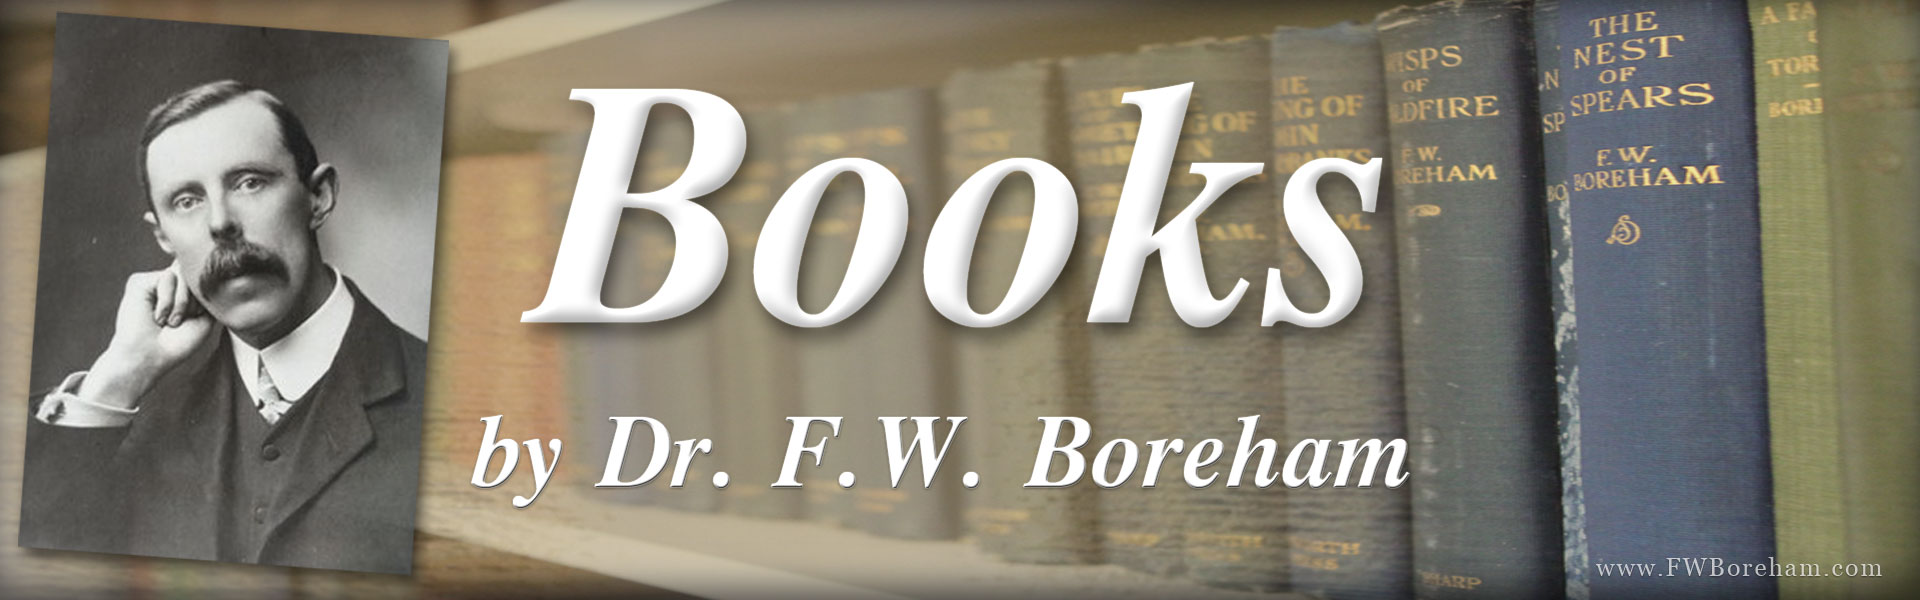 Books by Dr. F.W. Boreham